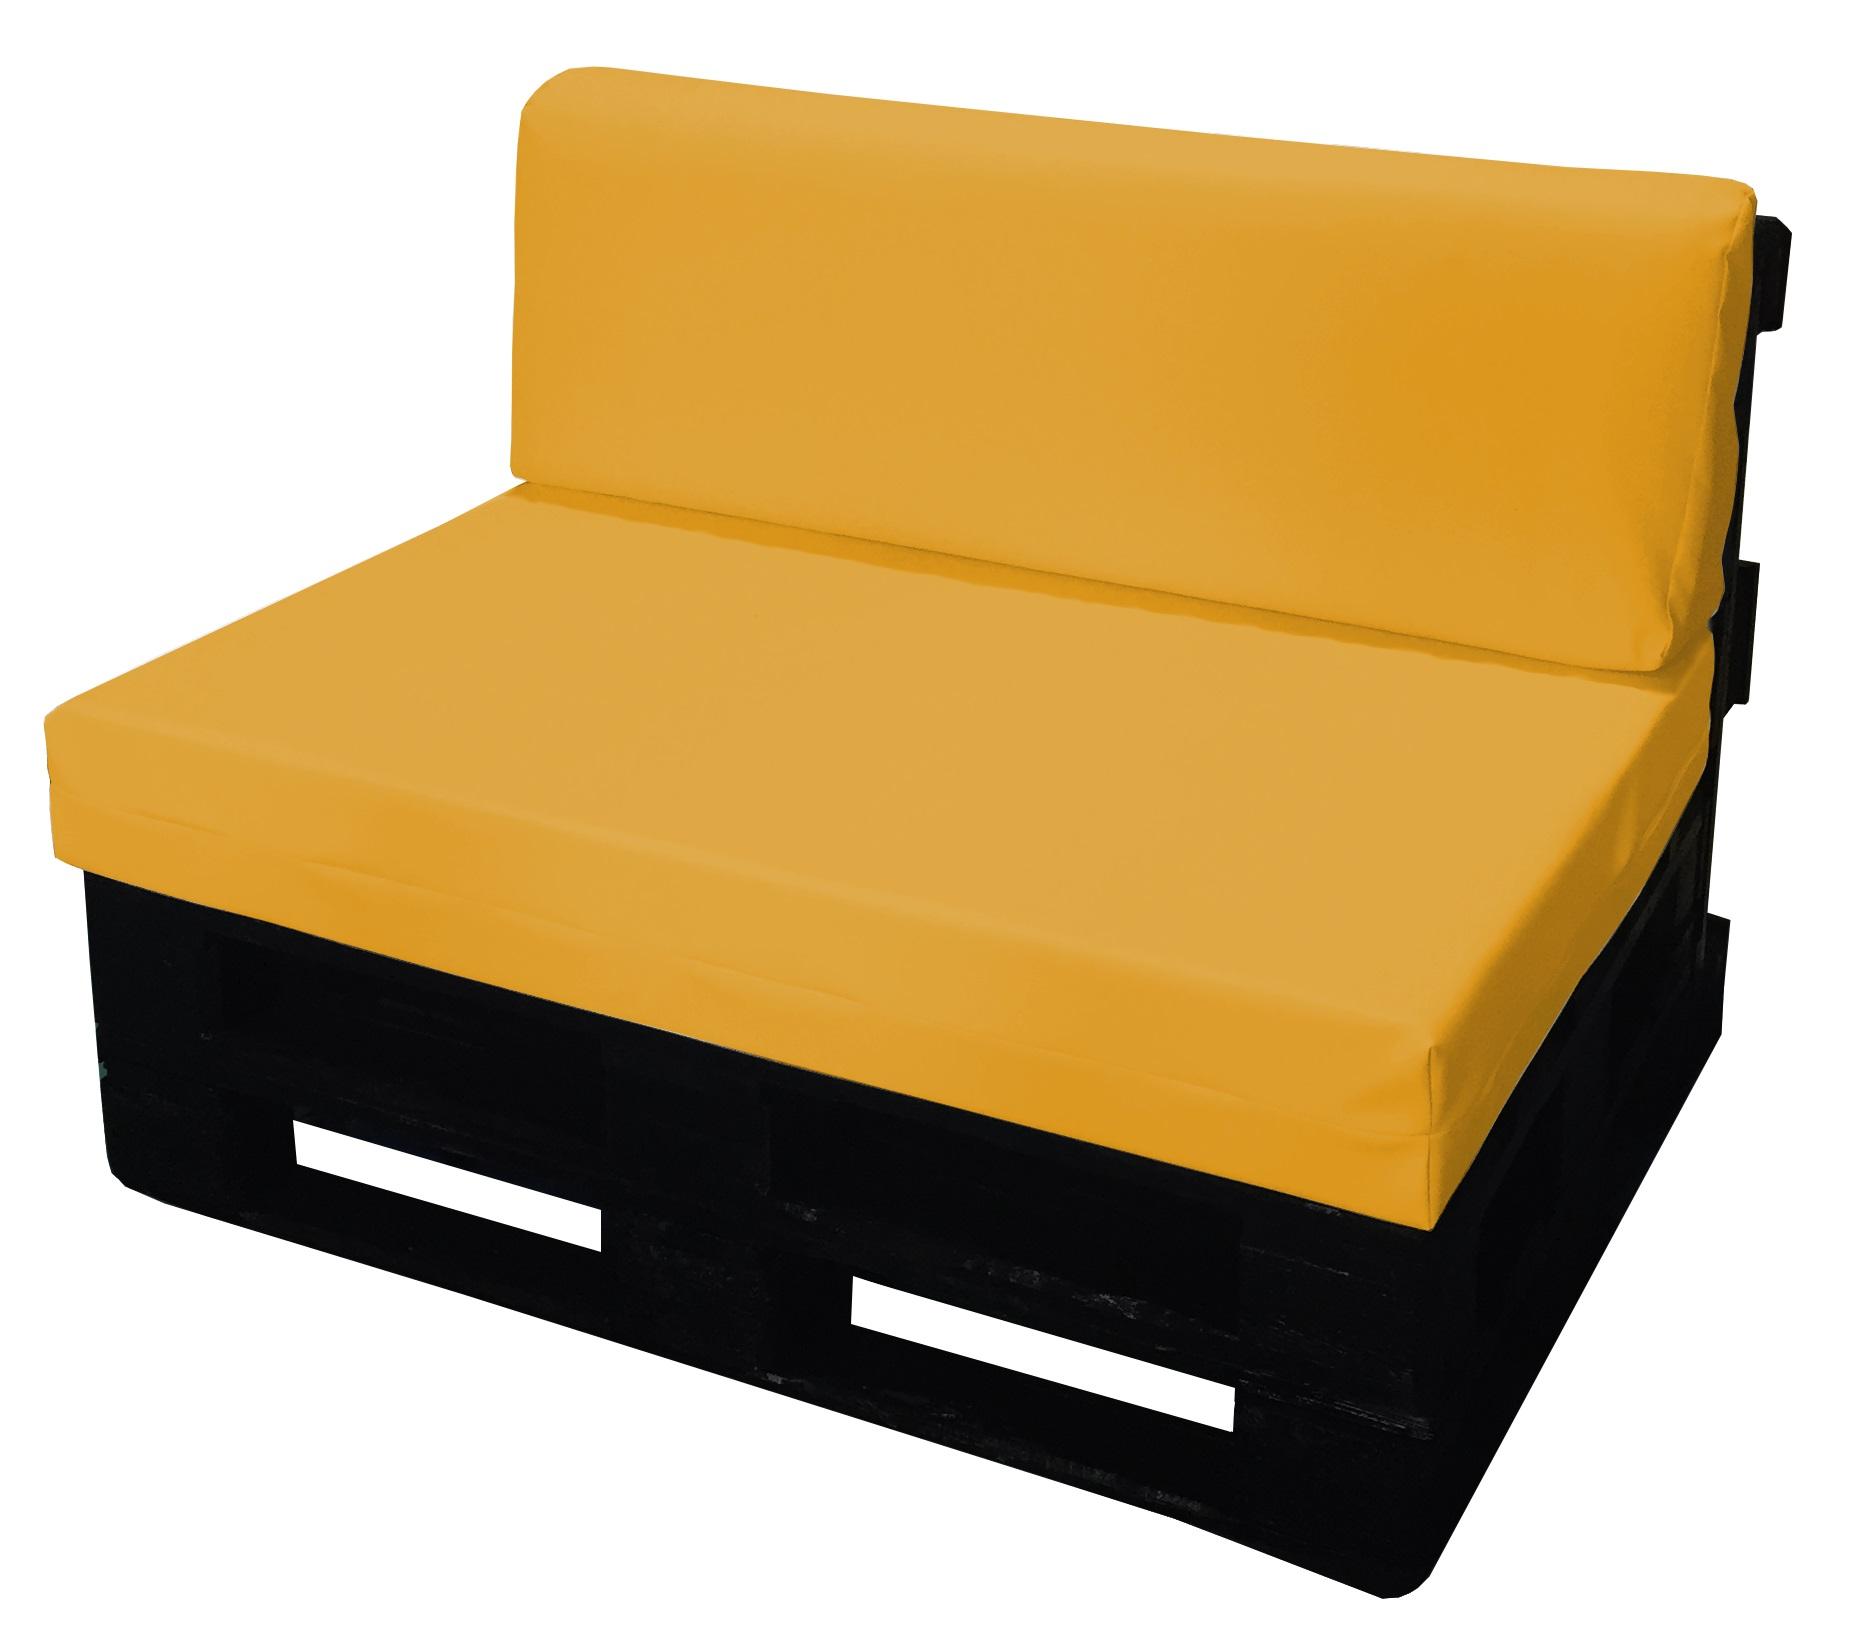 Cuscini Seduta Divano.Set Cuscino Per Bancale Seduta Schienale Divano Pallet Ecopelle